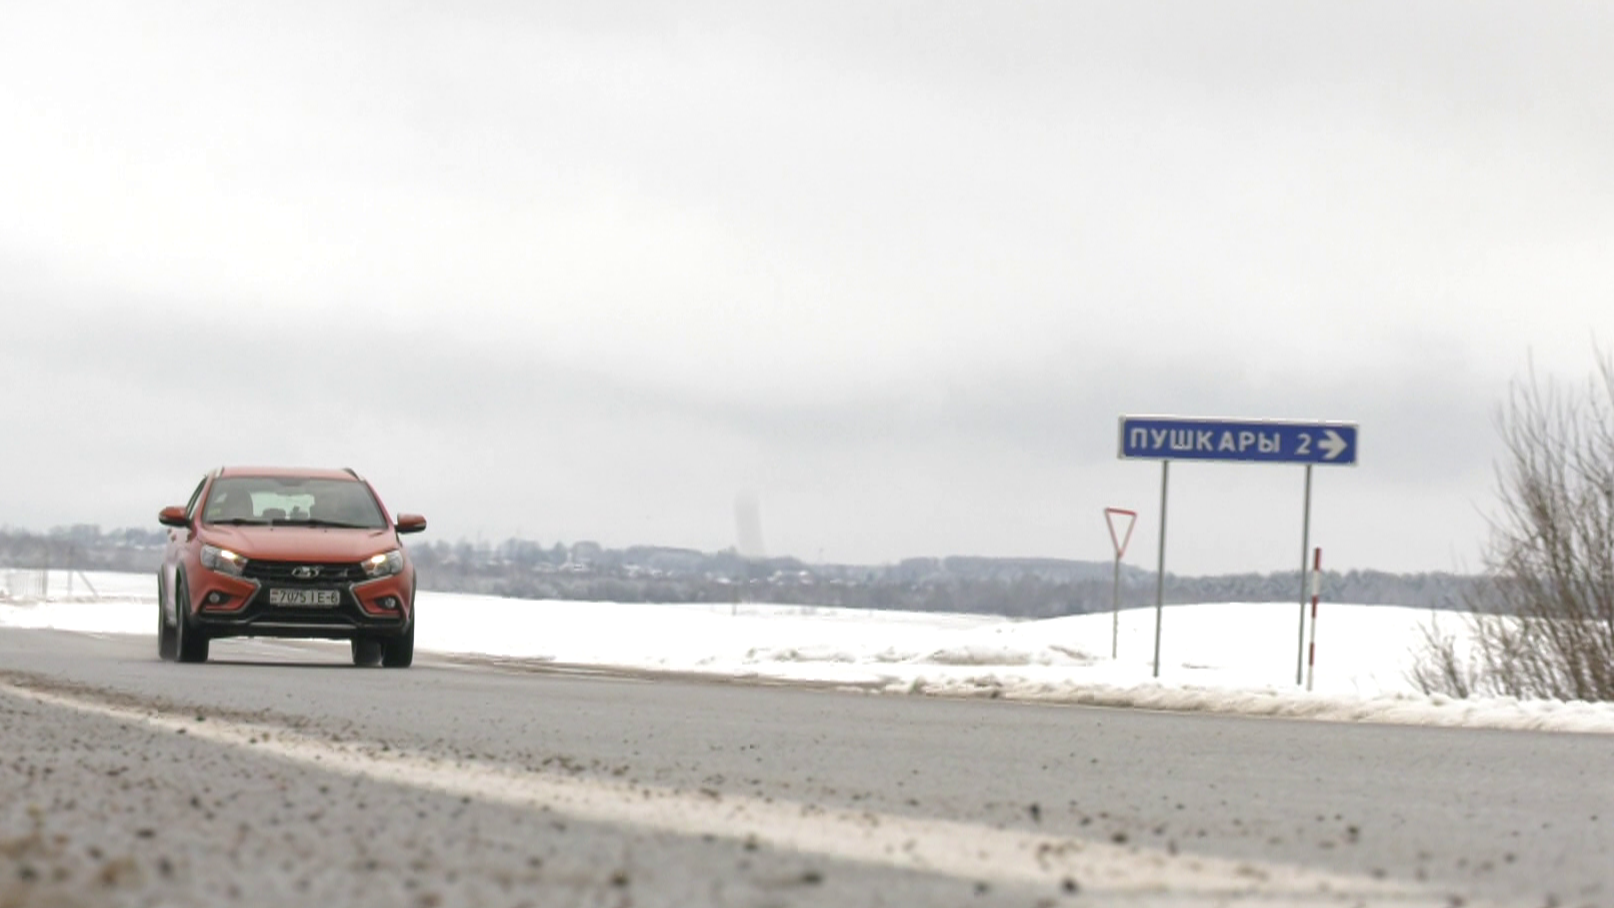 rejd - ГАИ усилила контроль на дорогах области (видео)